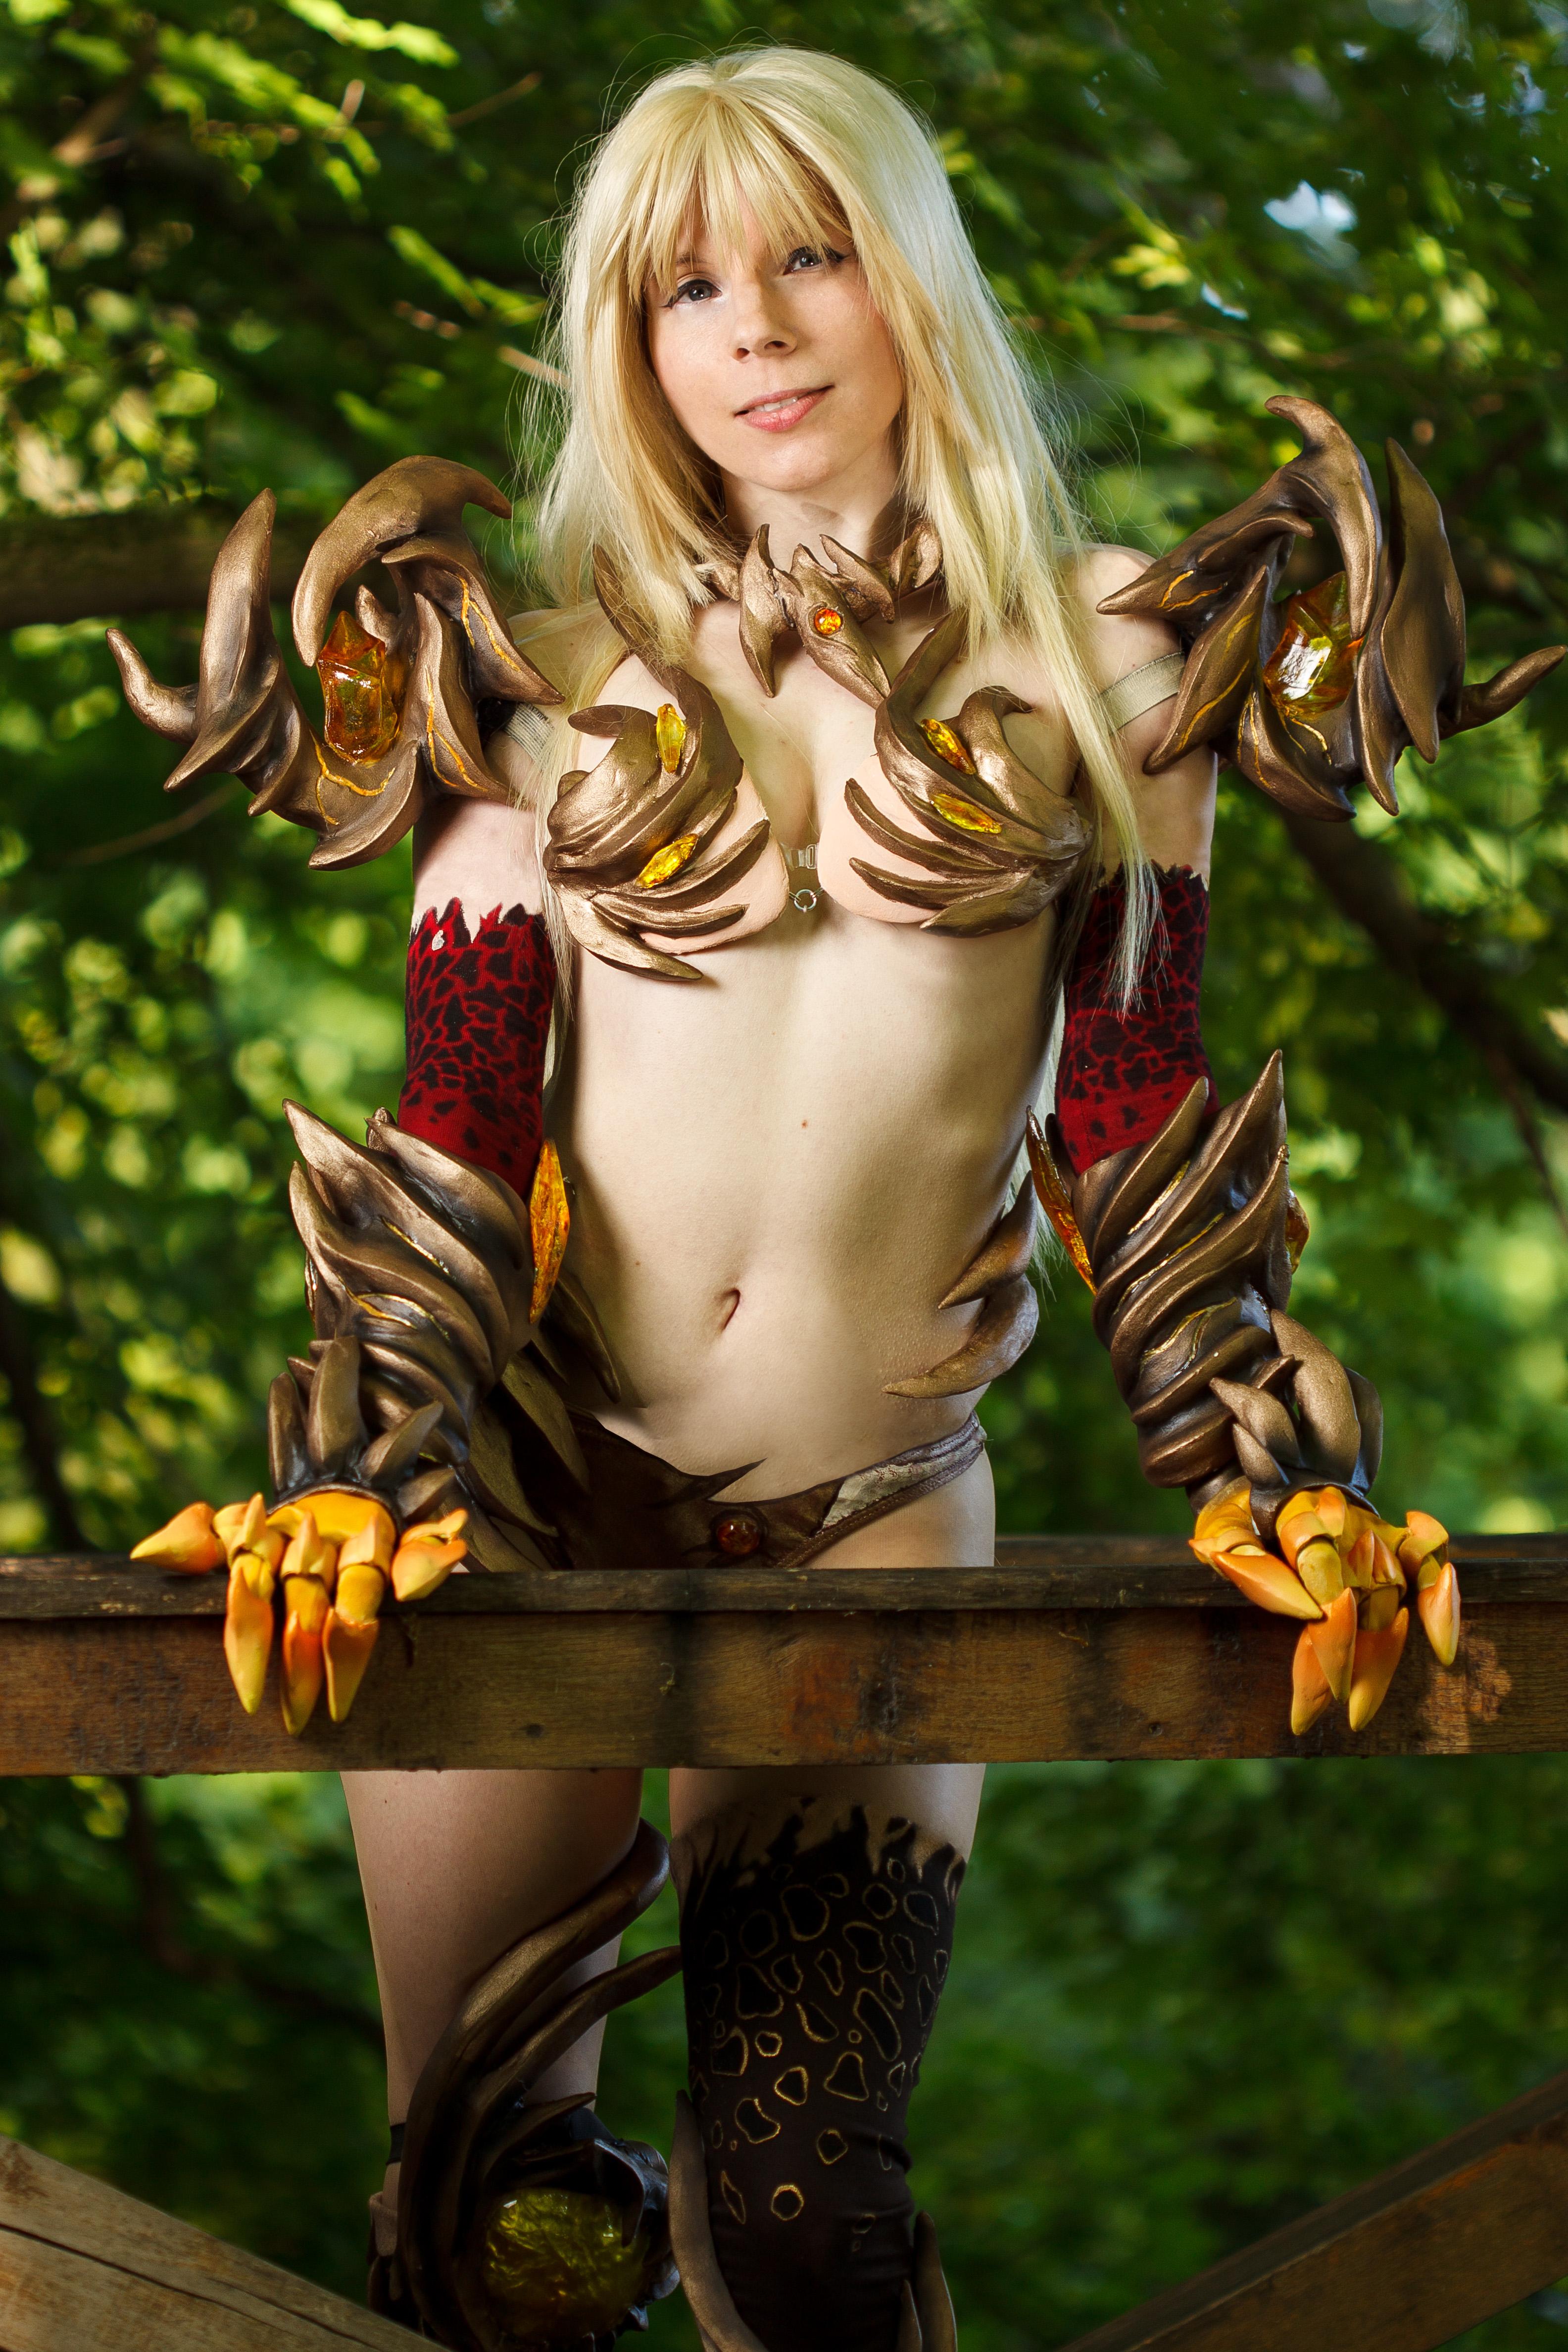 Elder scrolls online elf girl nude naked photos